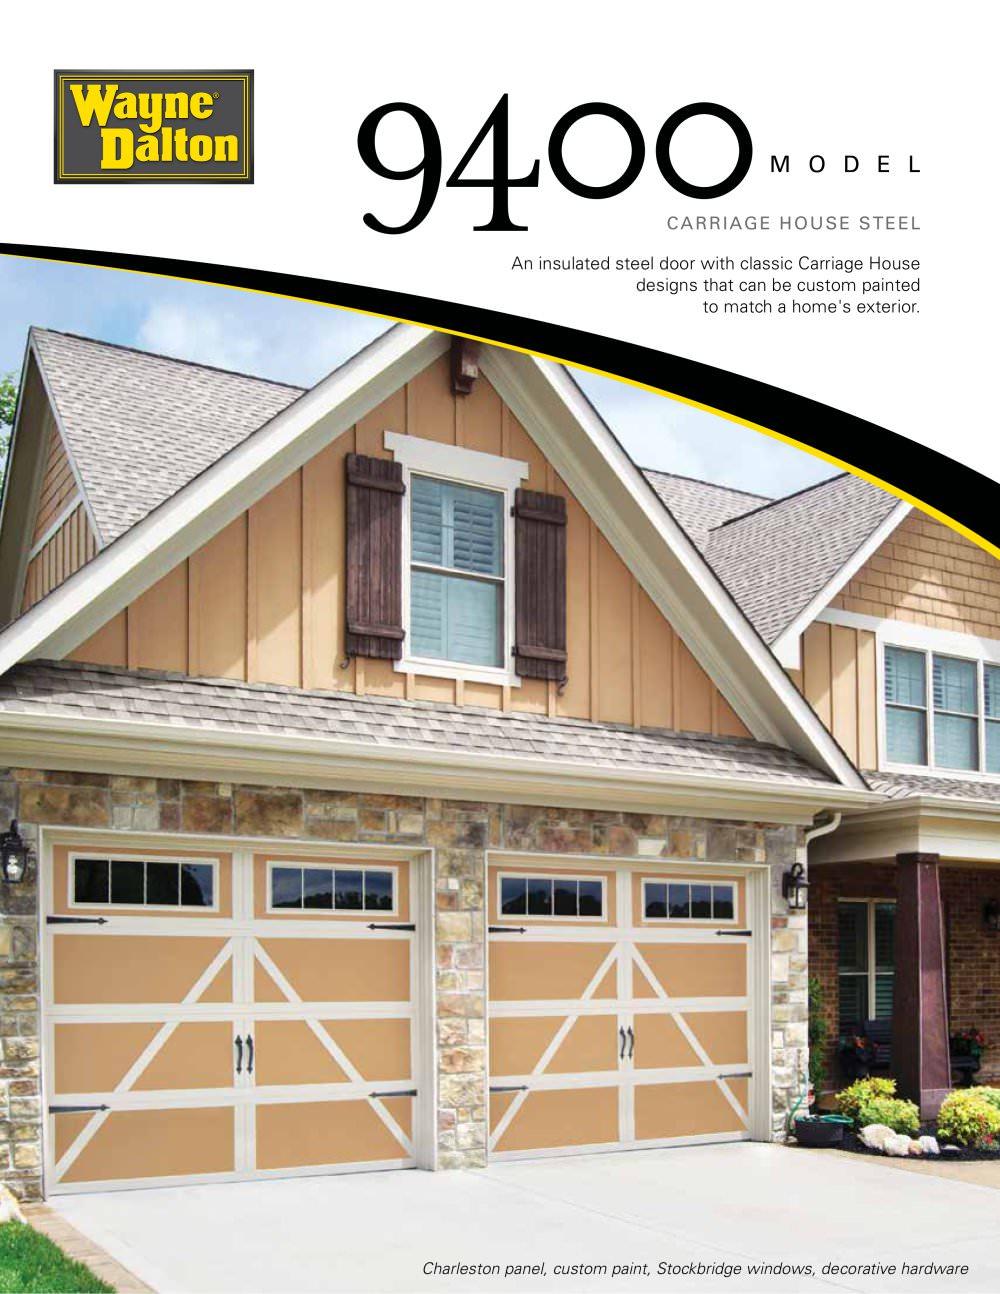 Wayne dalton 9700 garage doors - 9400 Model 1 4 Pages